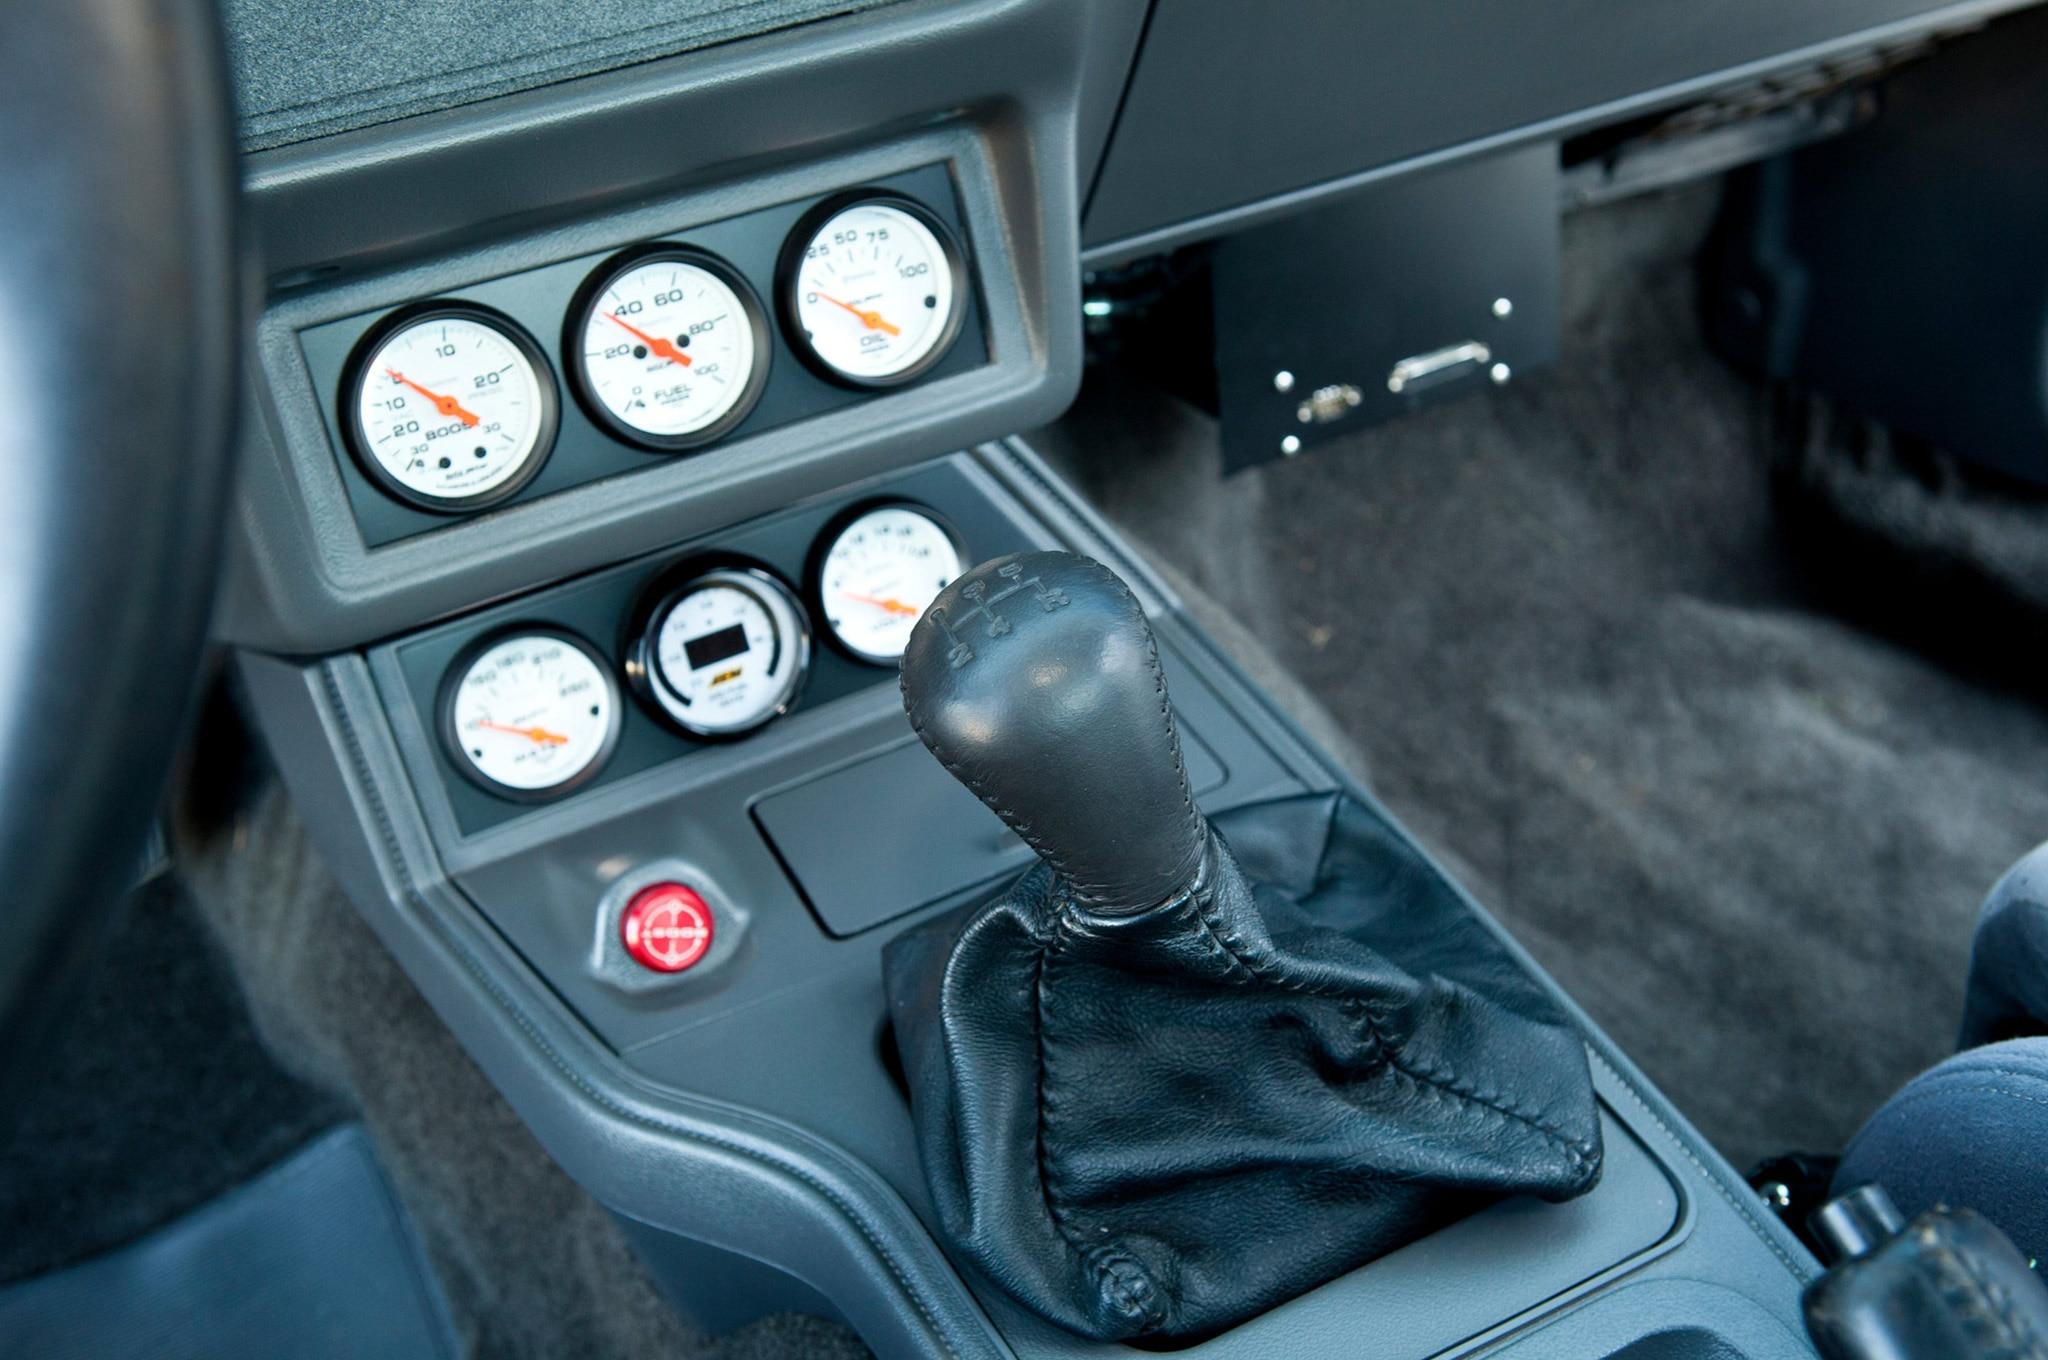 1986 Ford Mustang Svo 14